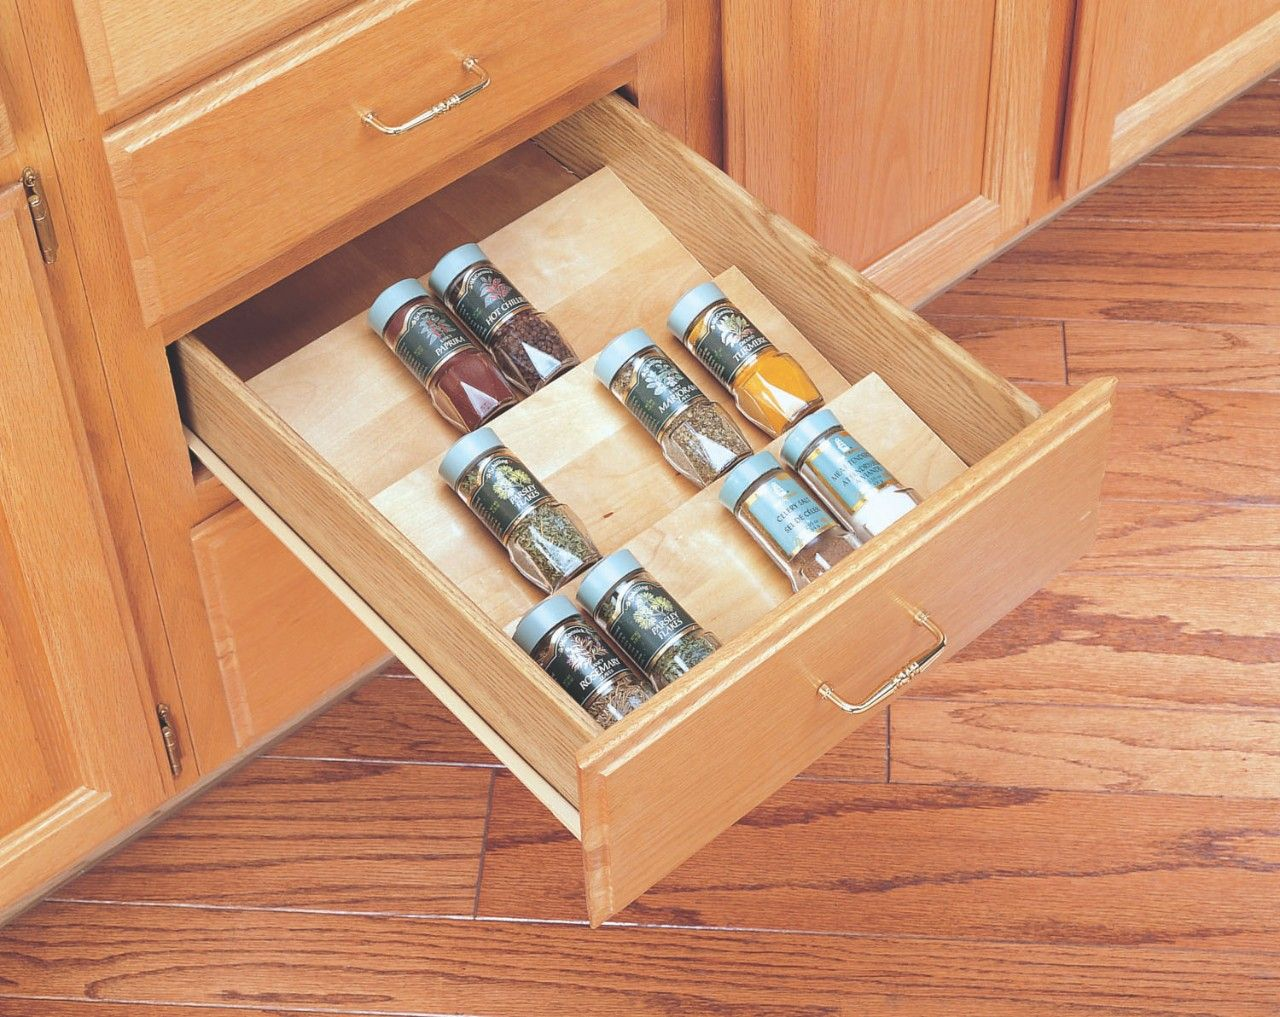 Cabinet and Closet Organizational Tips